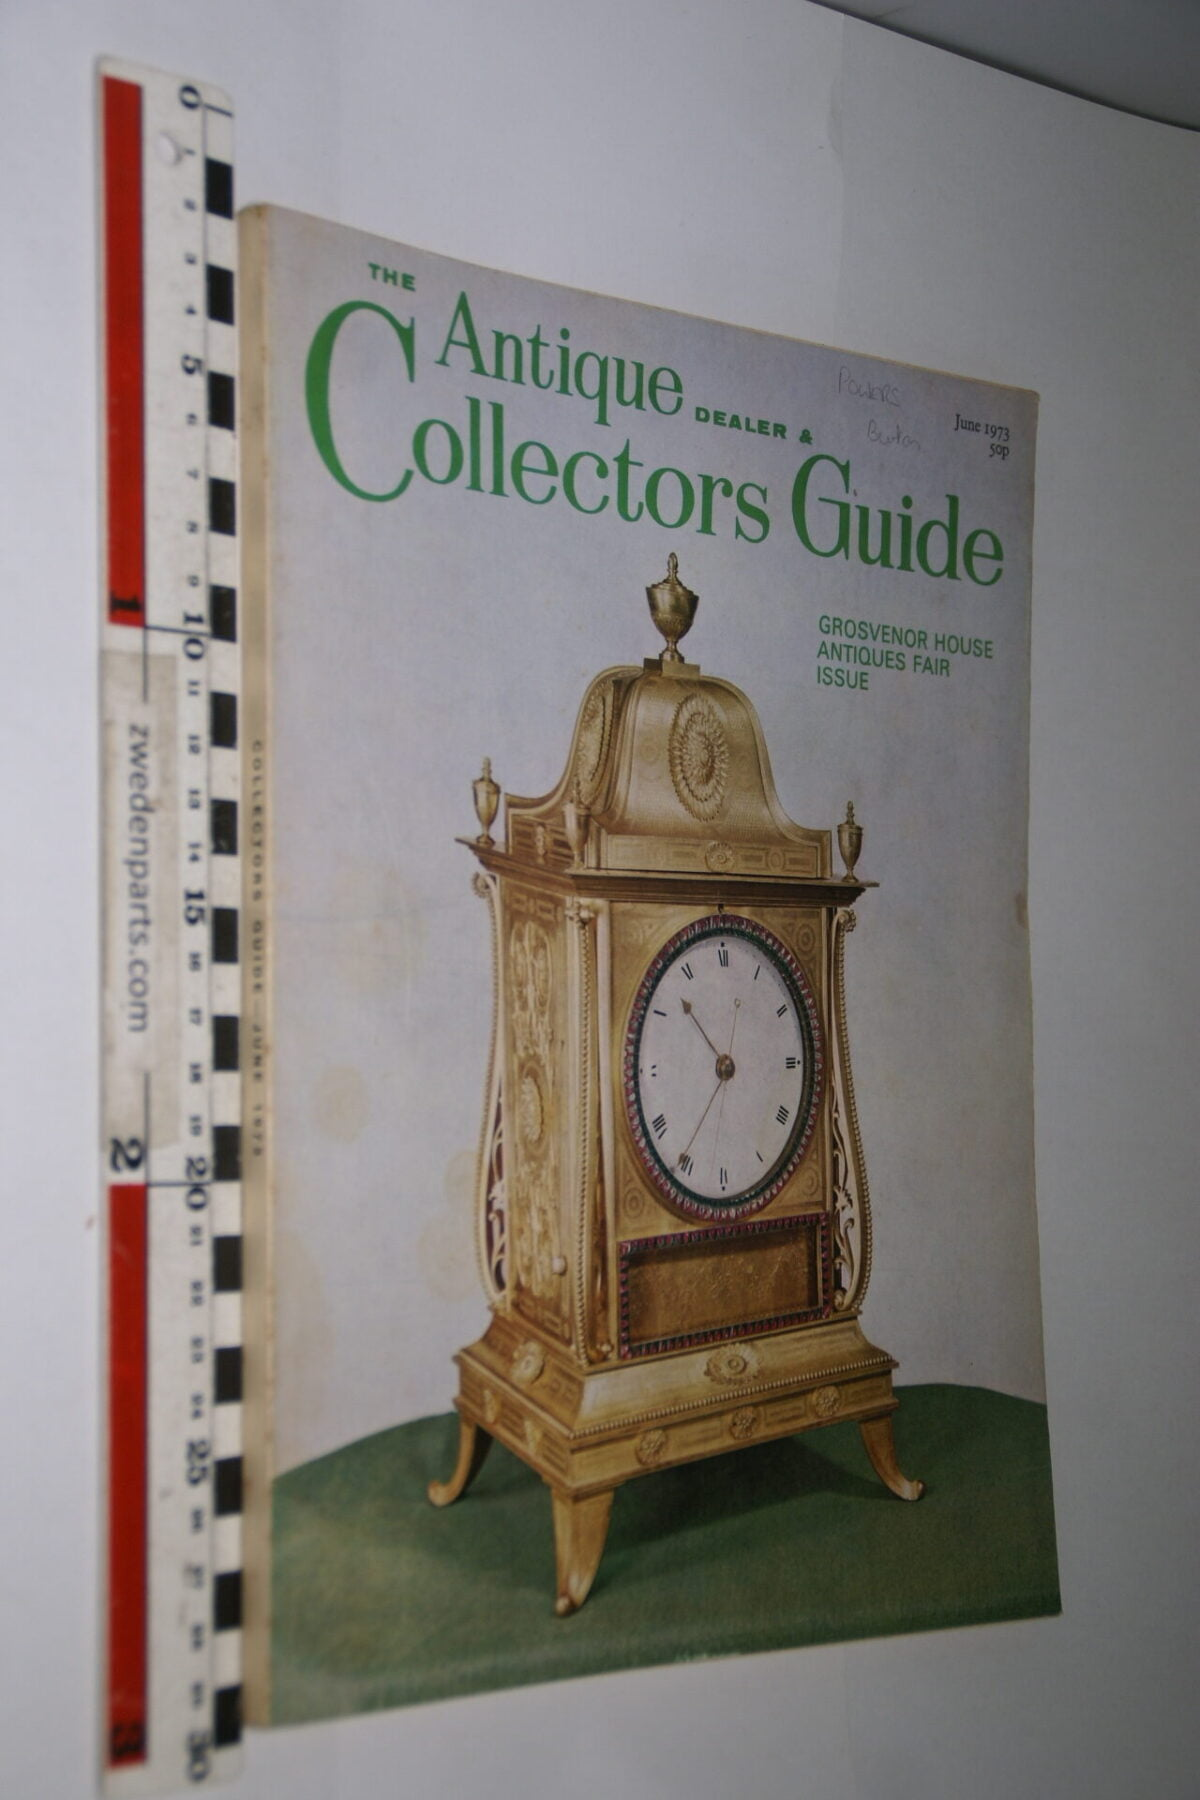 DSC06215 1973 juni tijdschrift Antique Collectors Guide, English-48716139